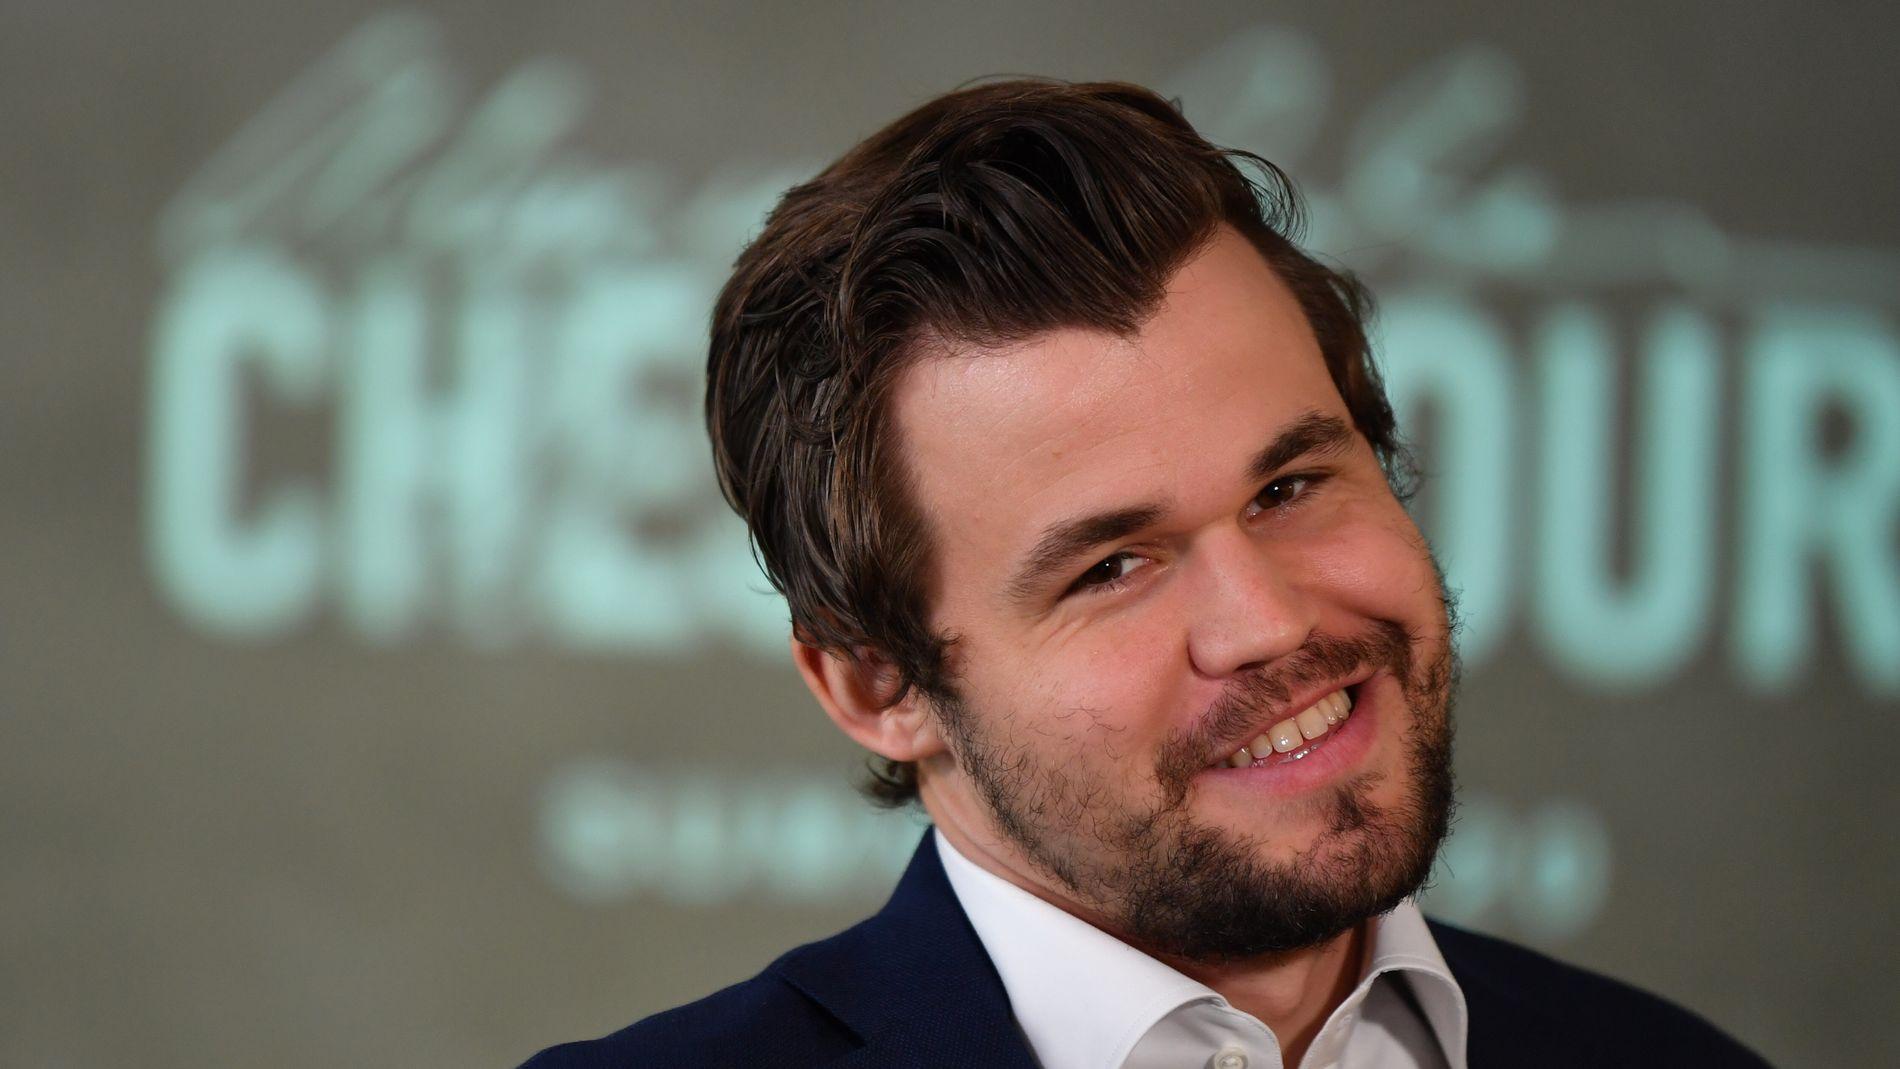 Historisk Carlsen Turnering Starter Lordag Kan Sparke I Gang Ny Tidsalder Vg